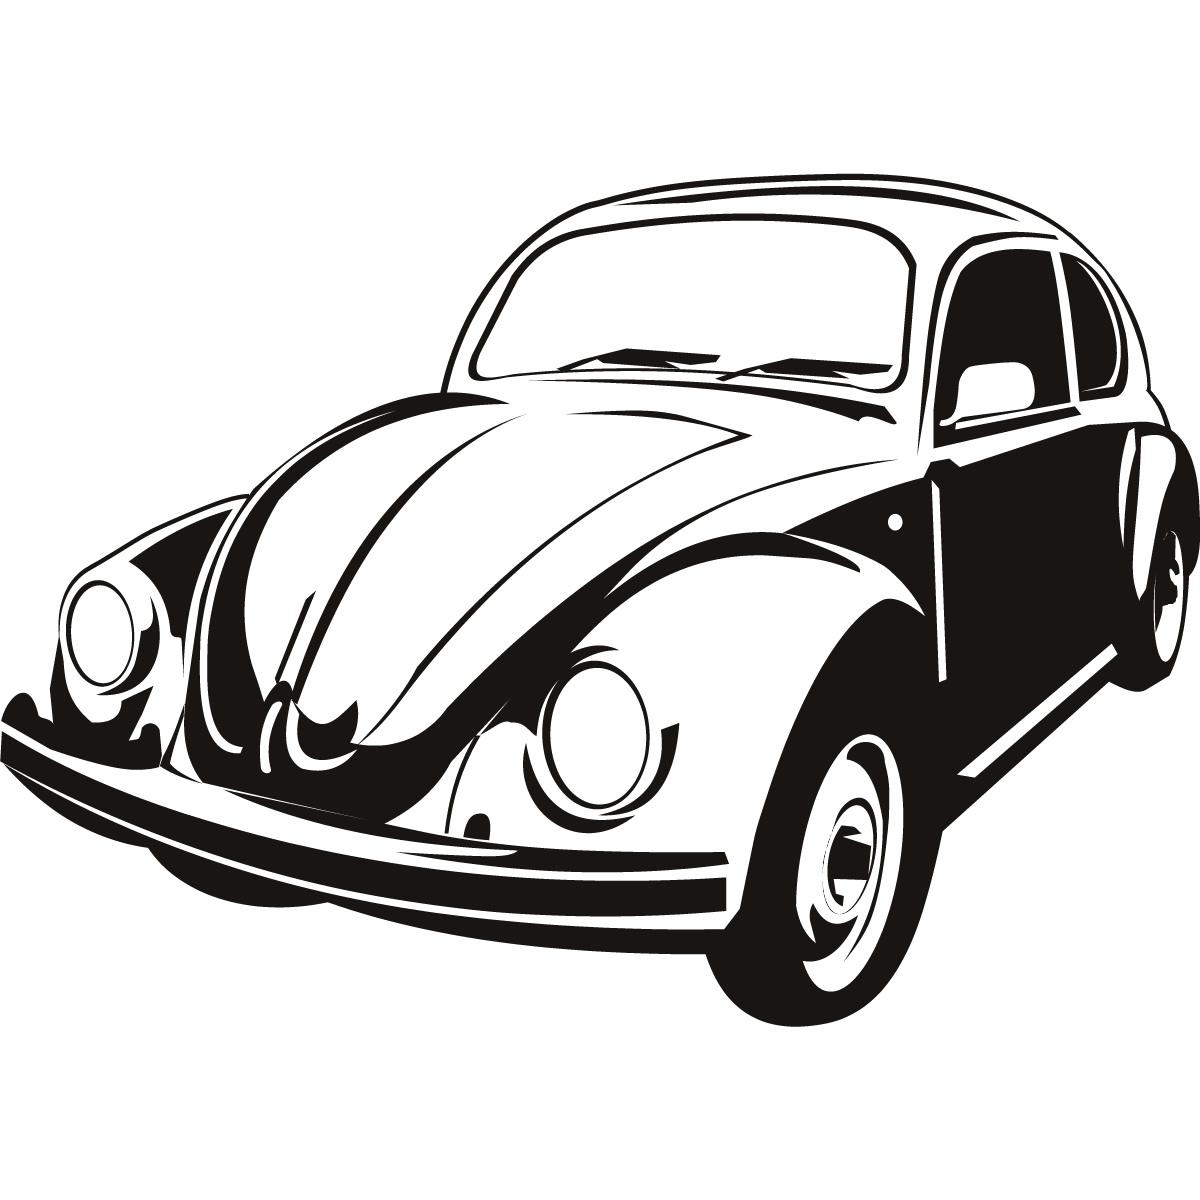 Volkswagen Beetle Line Drawing Sketch Coloring Page